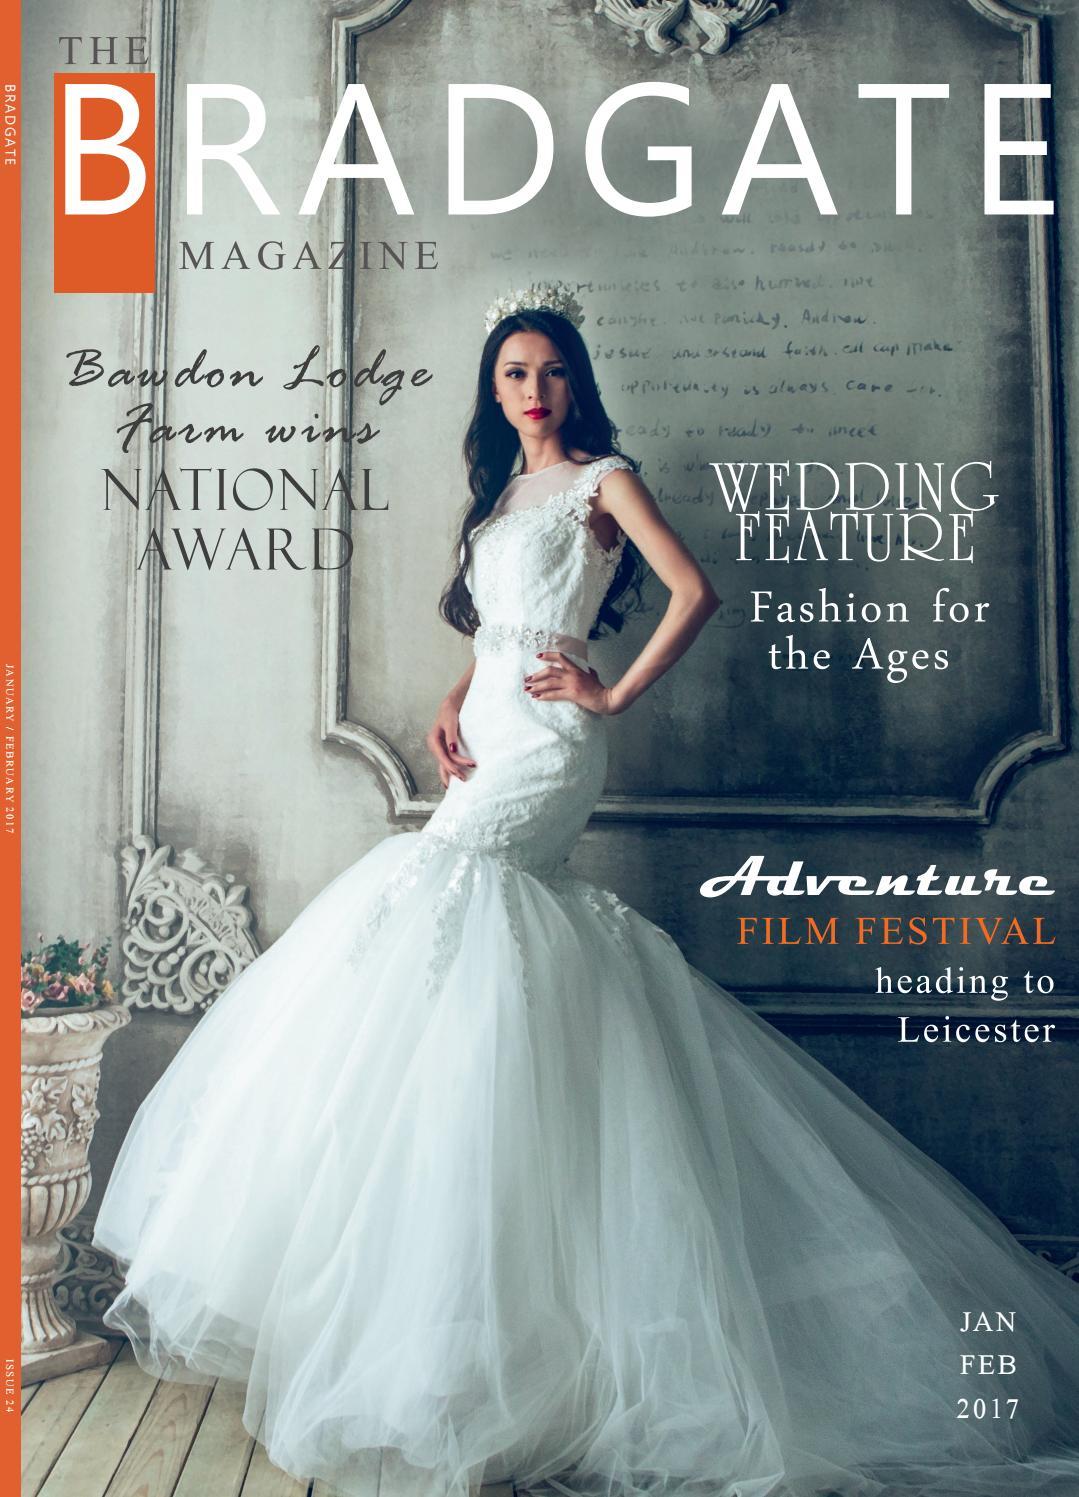 The Bradgate Magazine - January 2017 by The Bradgate Magazine -  Leicestershire - issuu